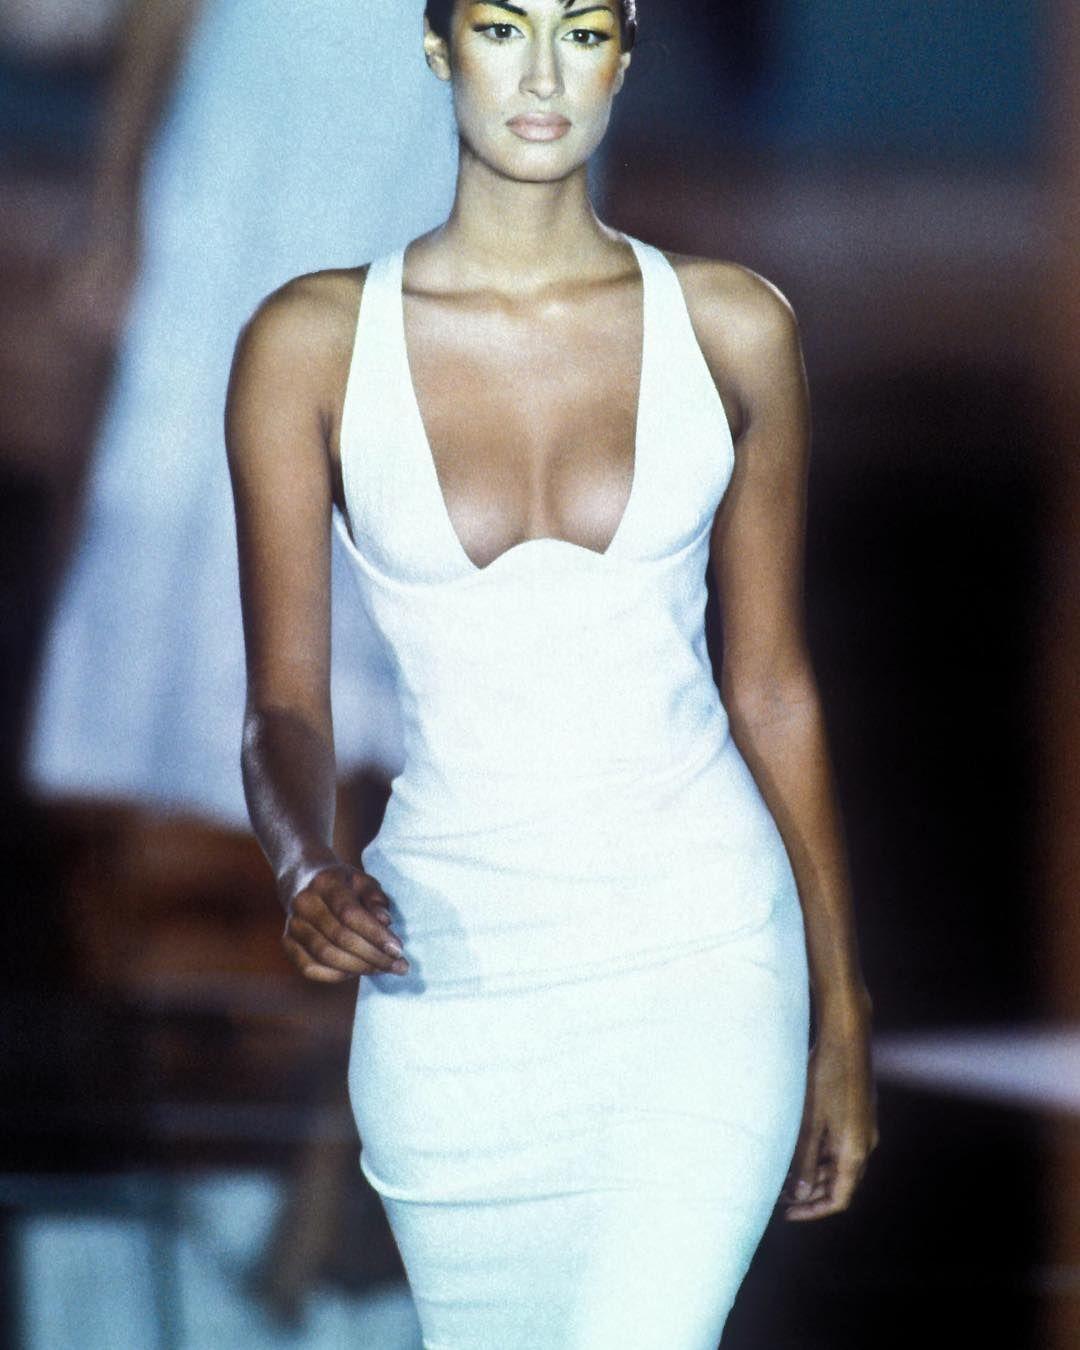 Bikini Bikini Yasmeen Ghauri CAN 21996-1997  naked (75 pics), 2019, bra